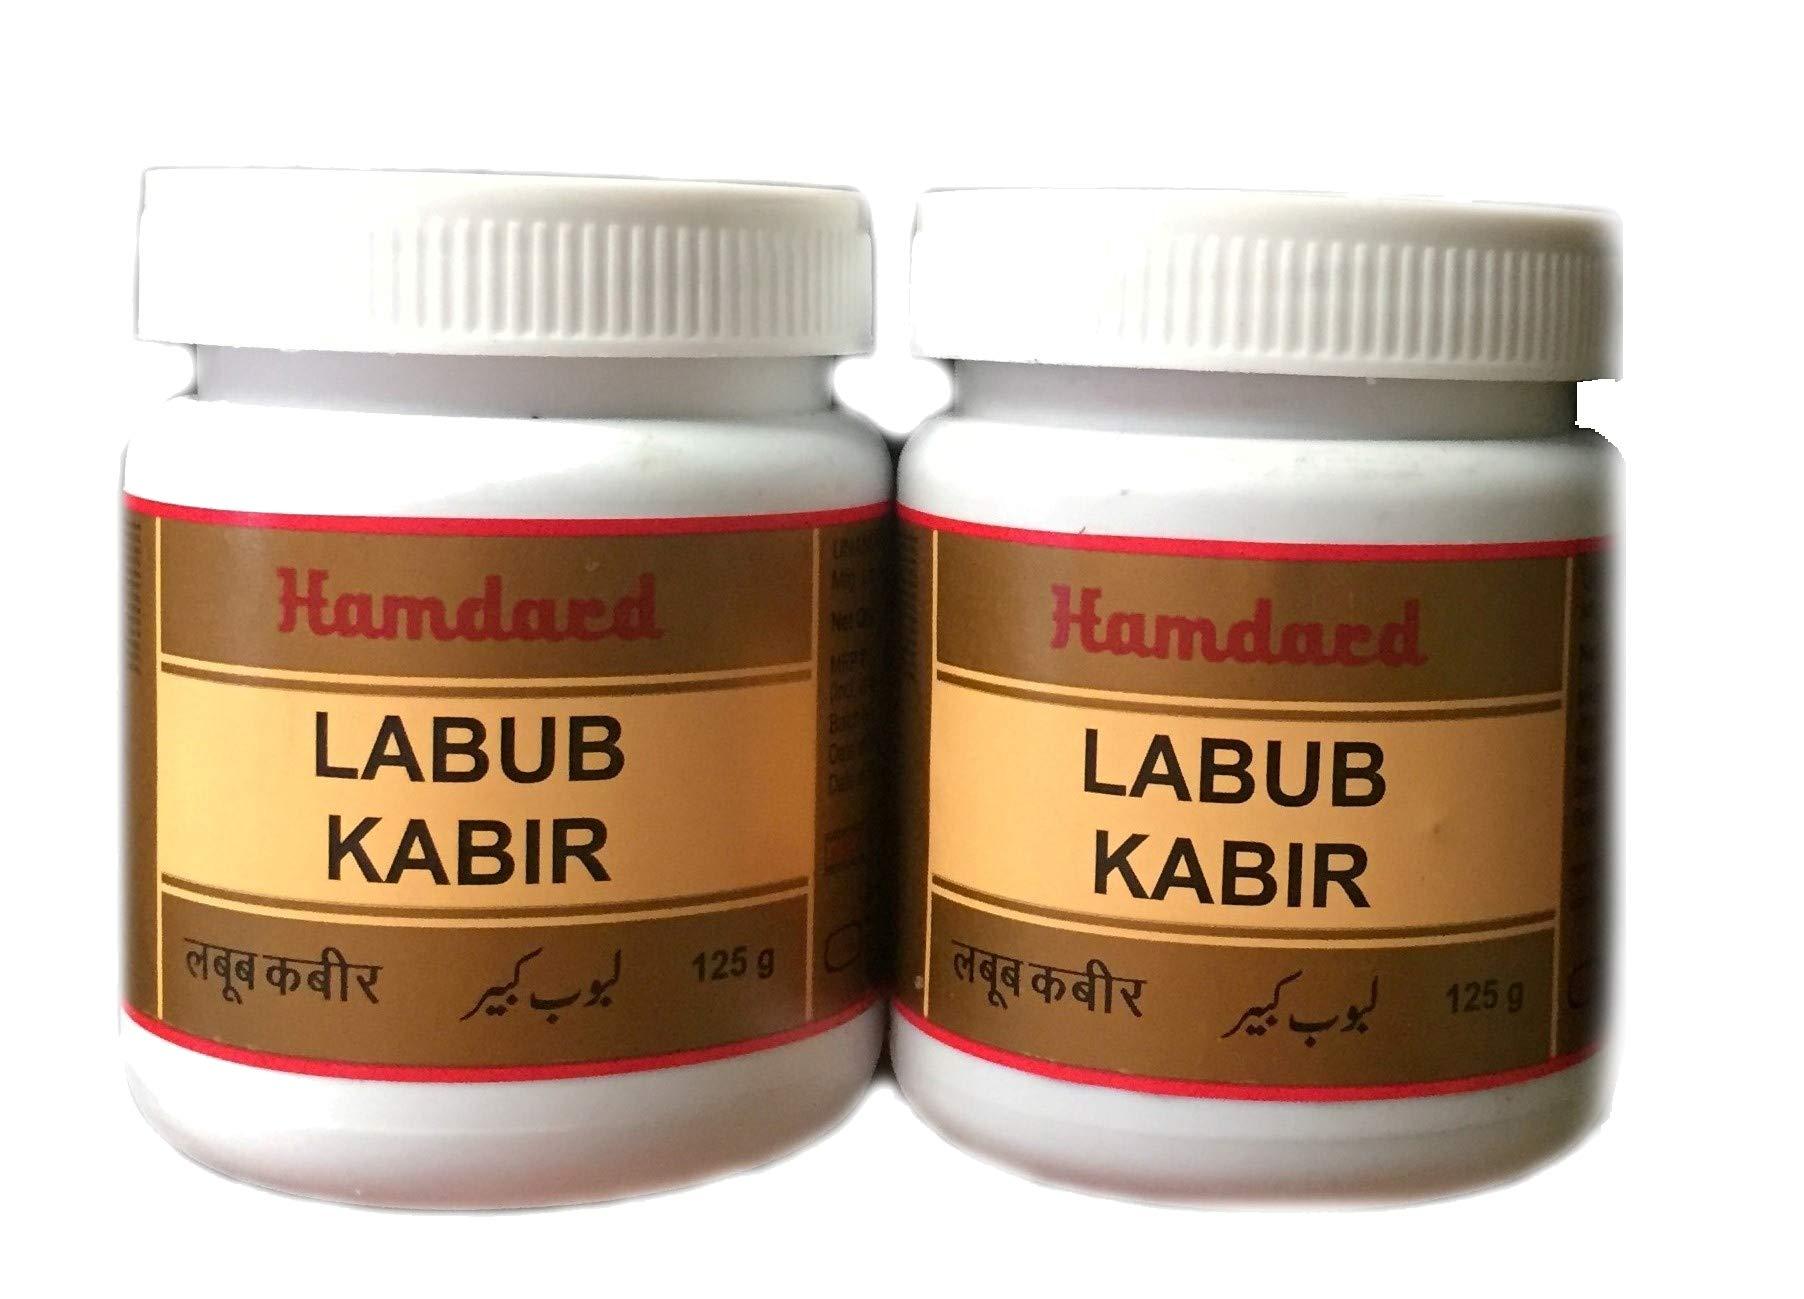 Hamdard Labub Kabir Pack of 2 (125 gm Each)